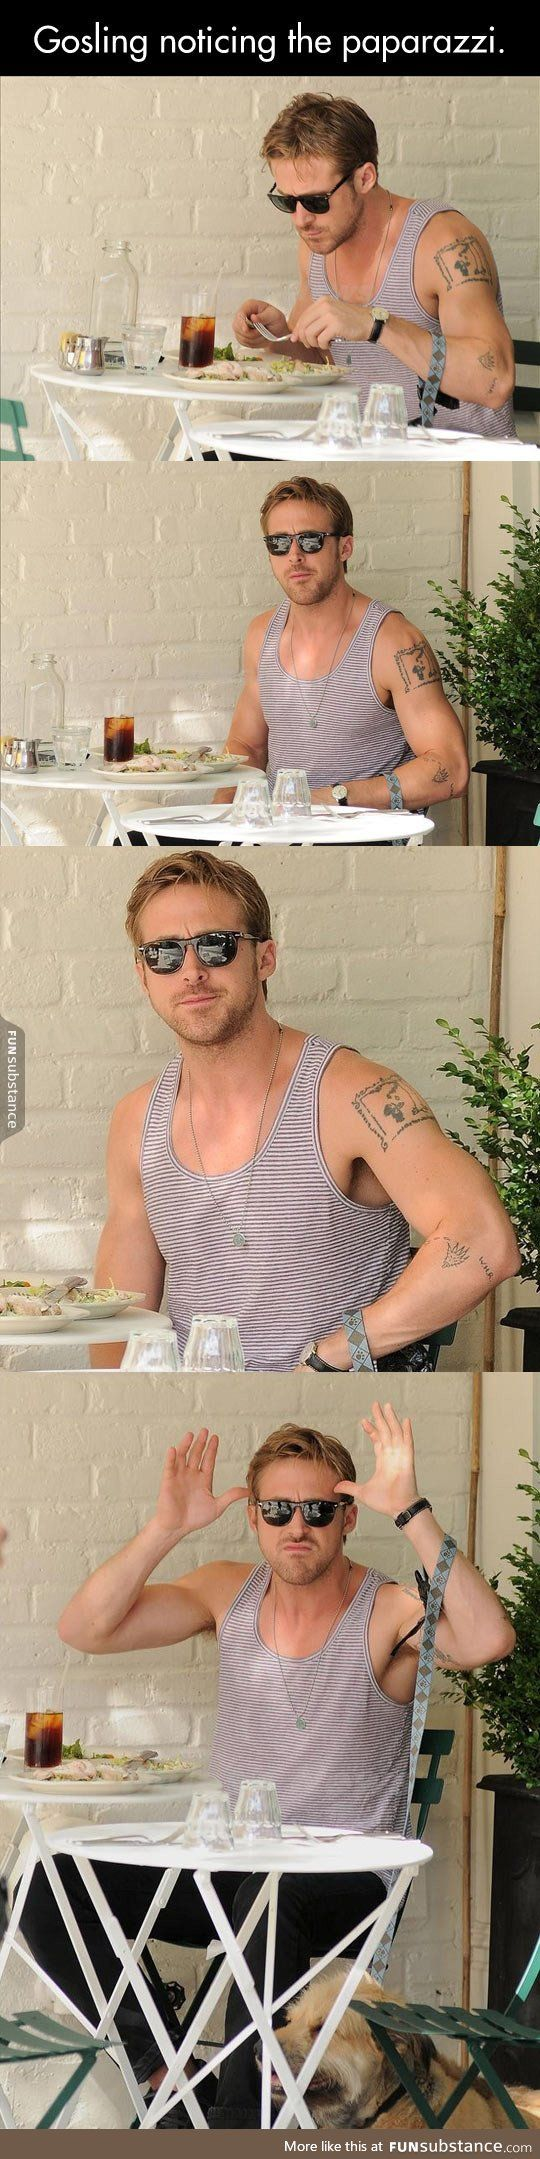 Ryan gosling wgeb he notices the paparazzi